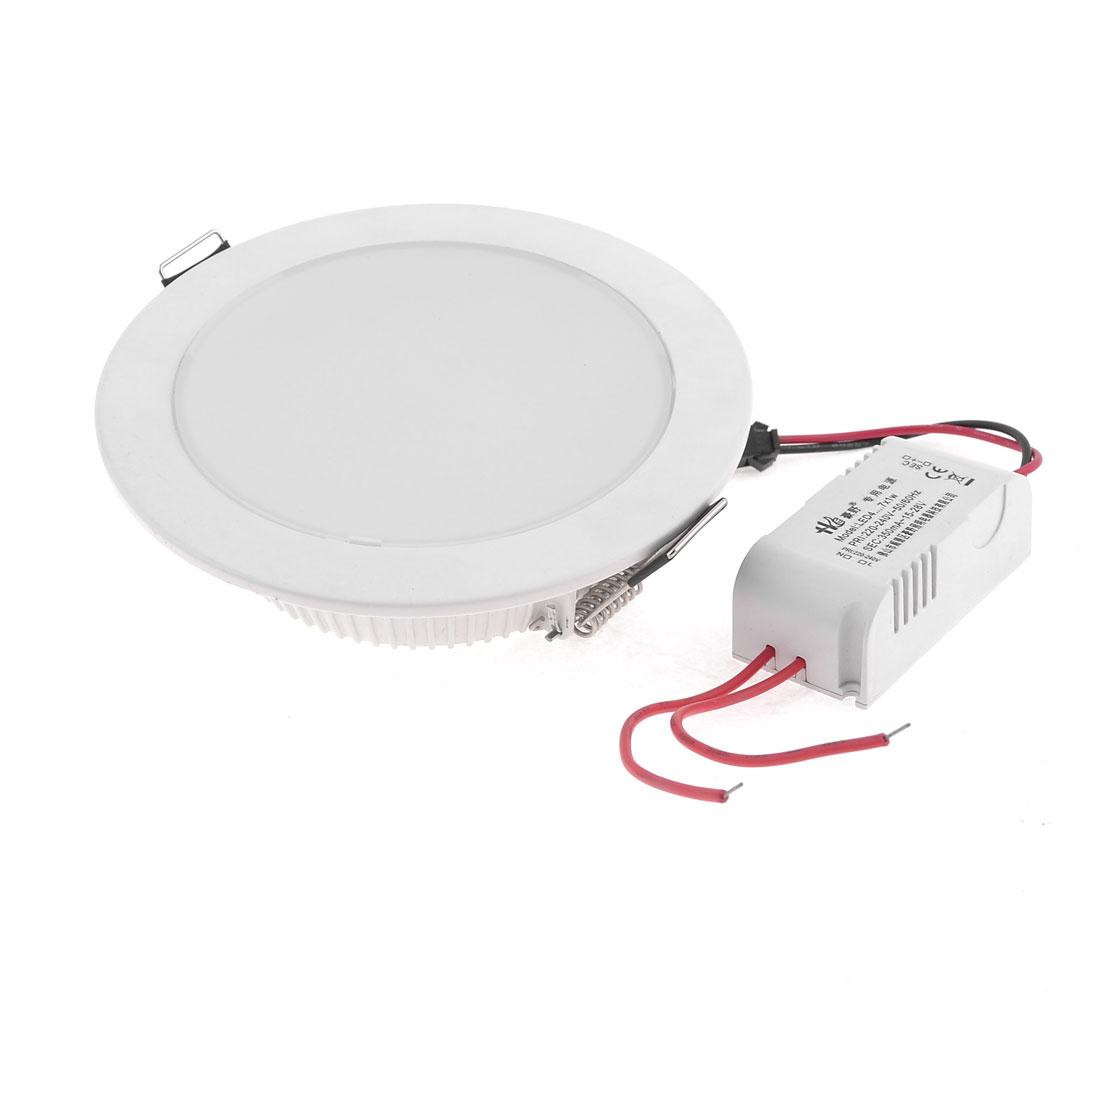 AC 220-240V White 7W 12 LEDs Ceiling Down Light Recessed Bulb w LED Driver